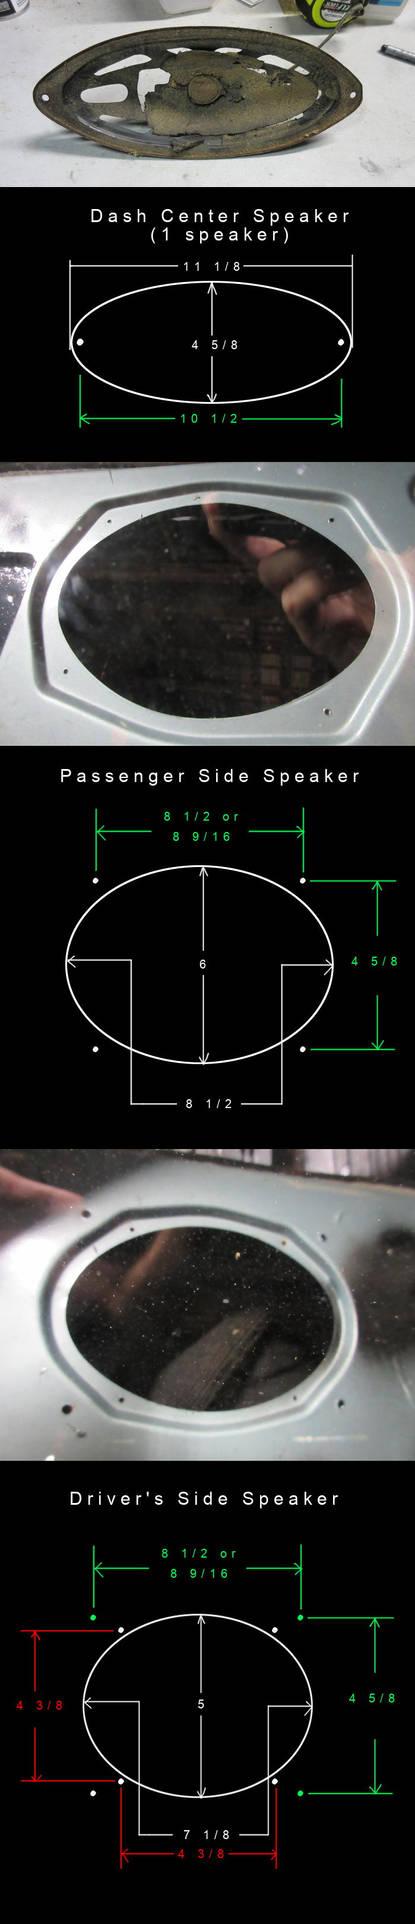 Odd speakers in old cars. Y63kllty